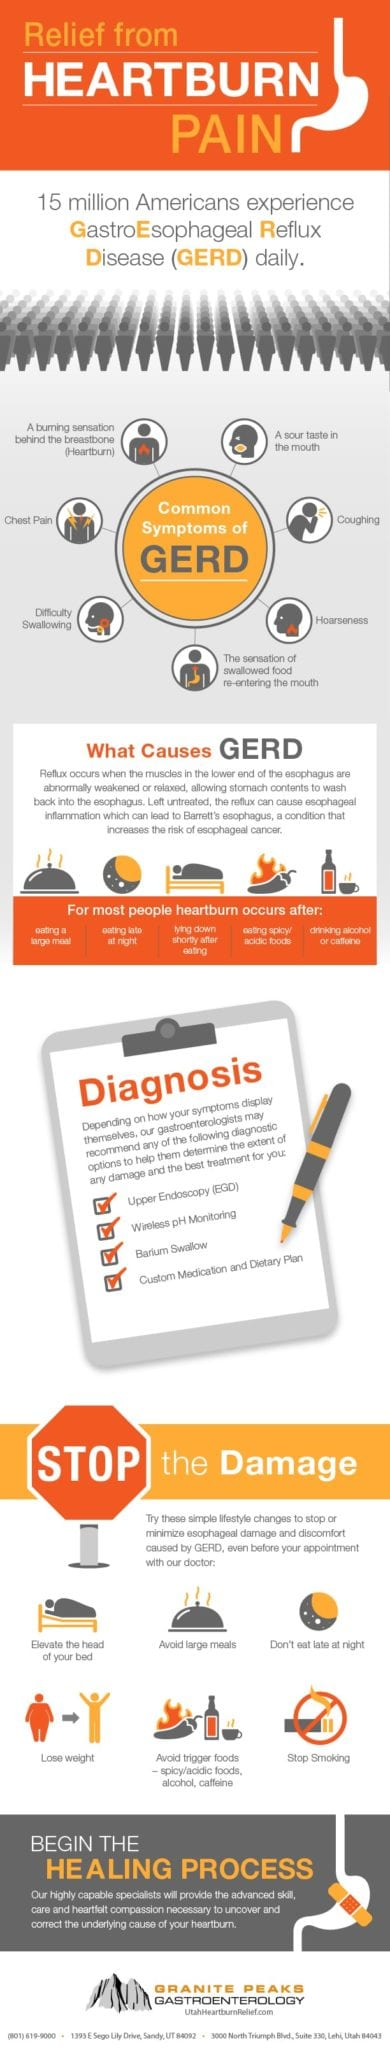 heartburn infographic